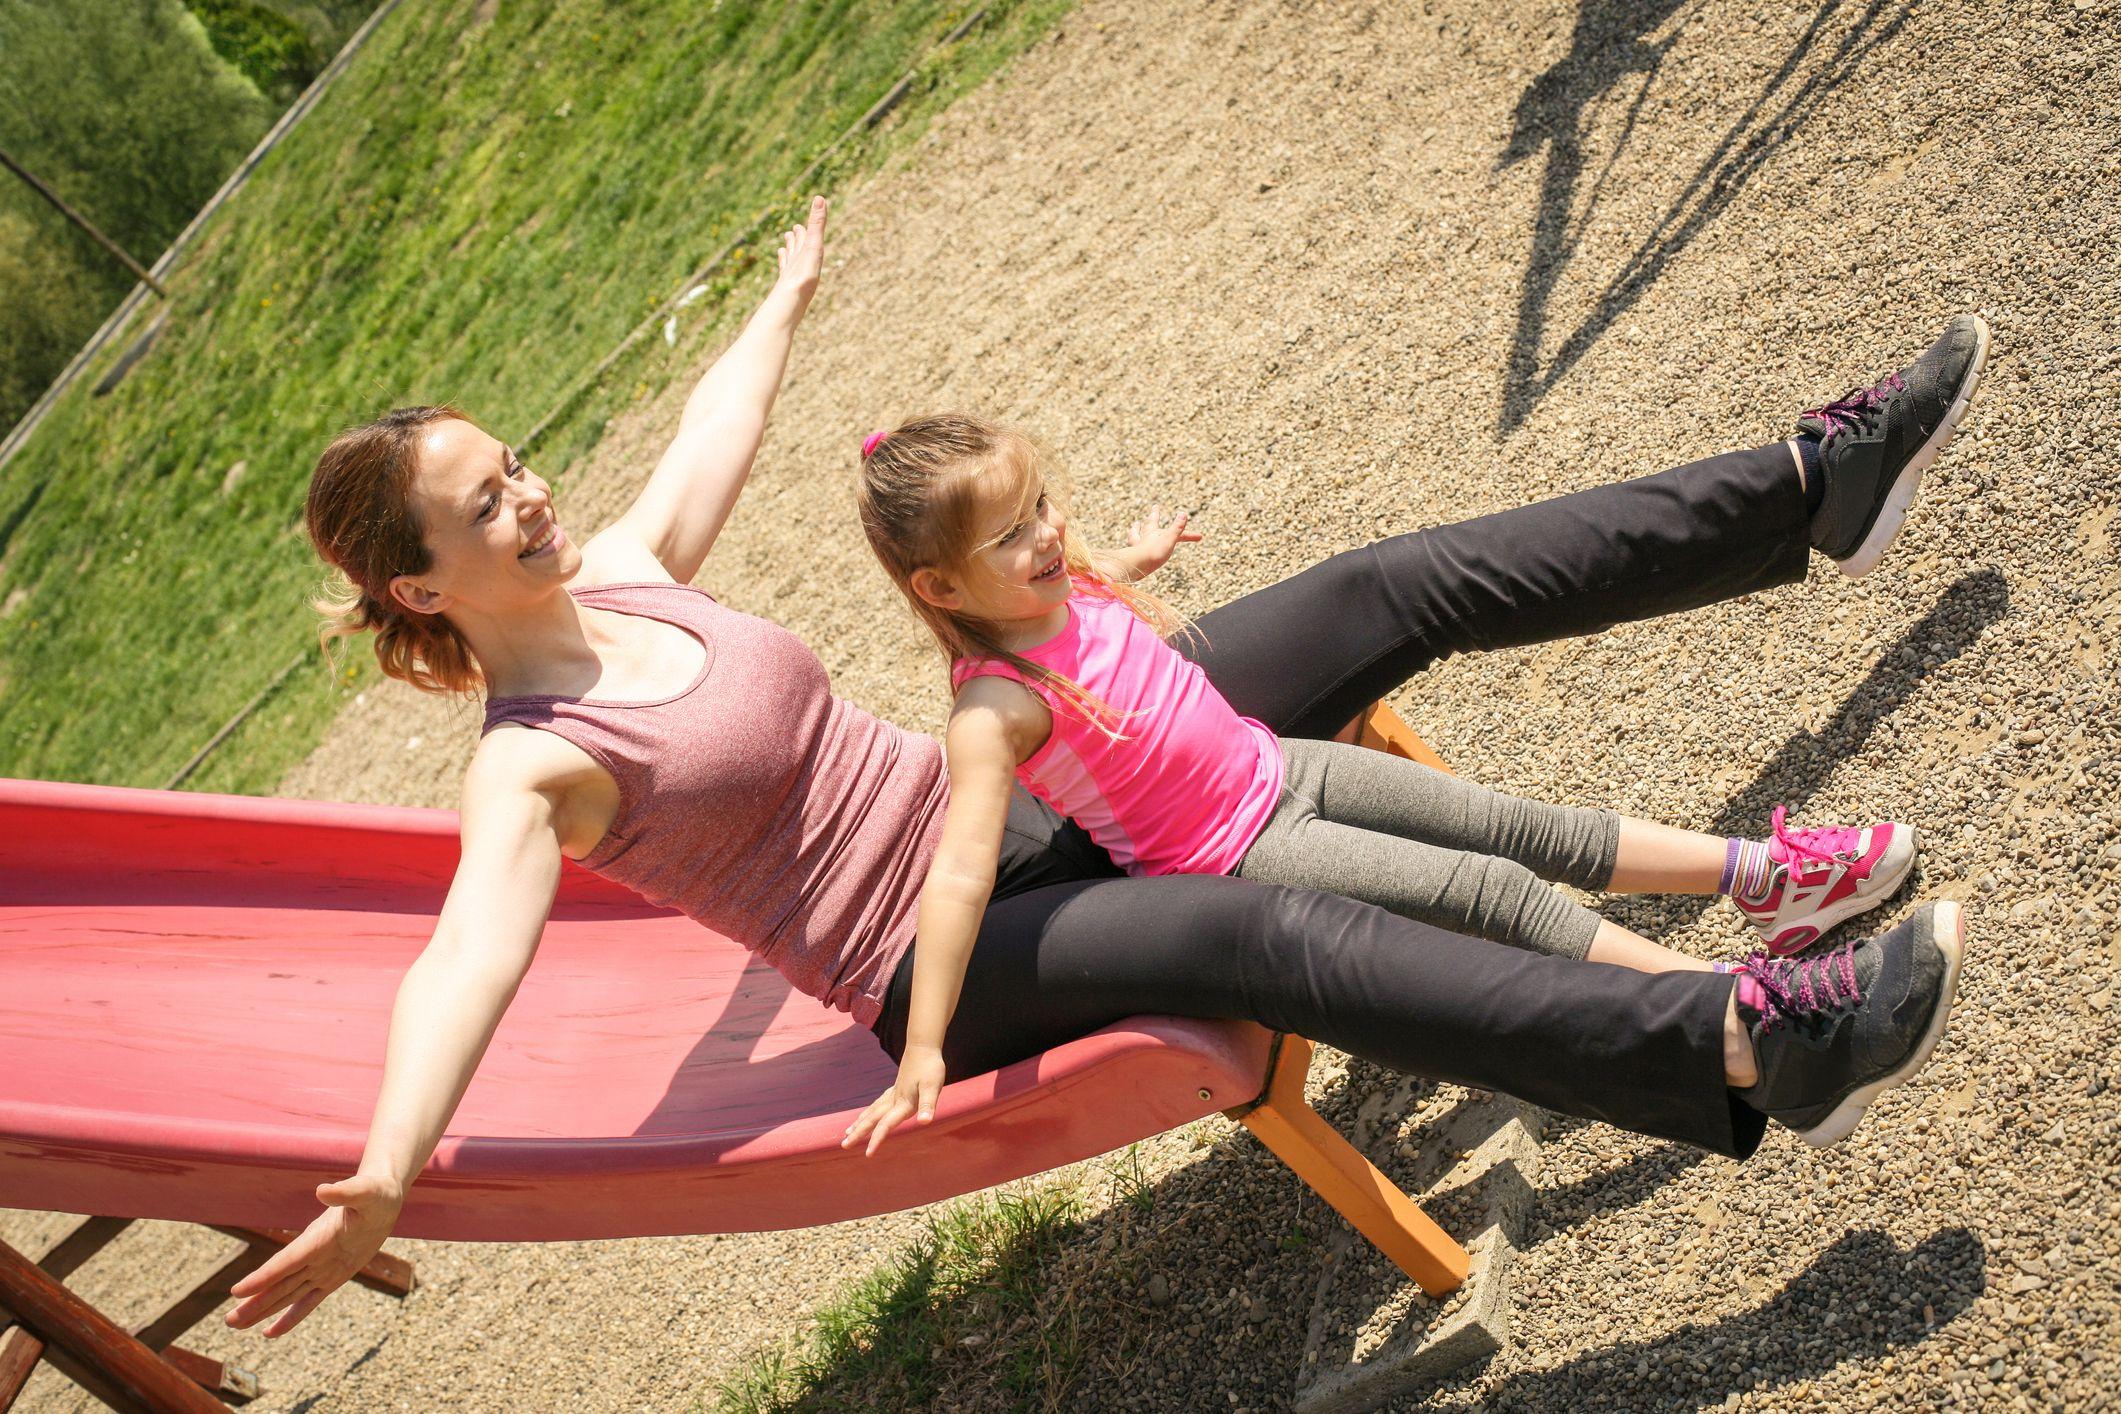 slide-parent-child-playground-stock